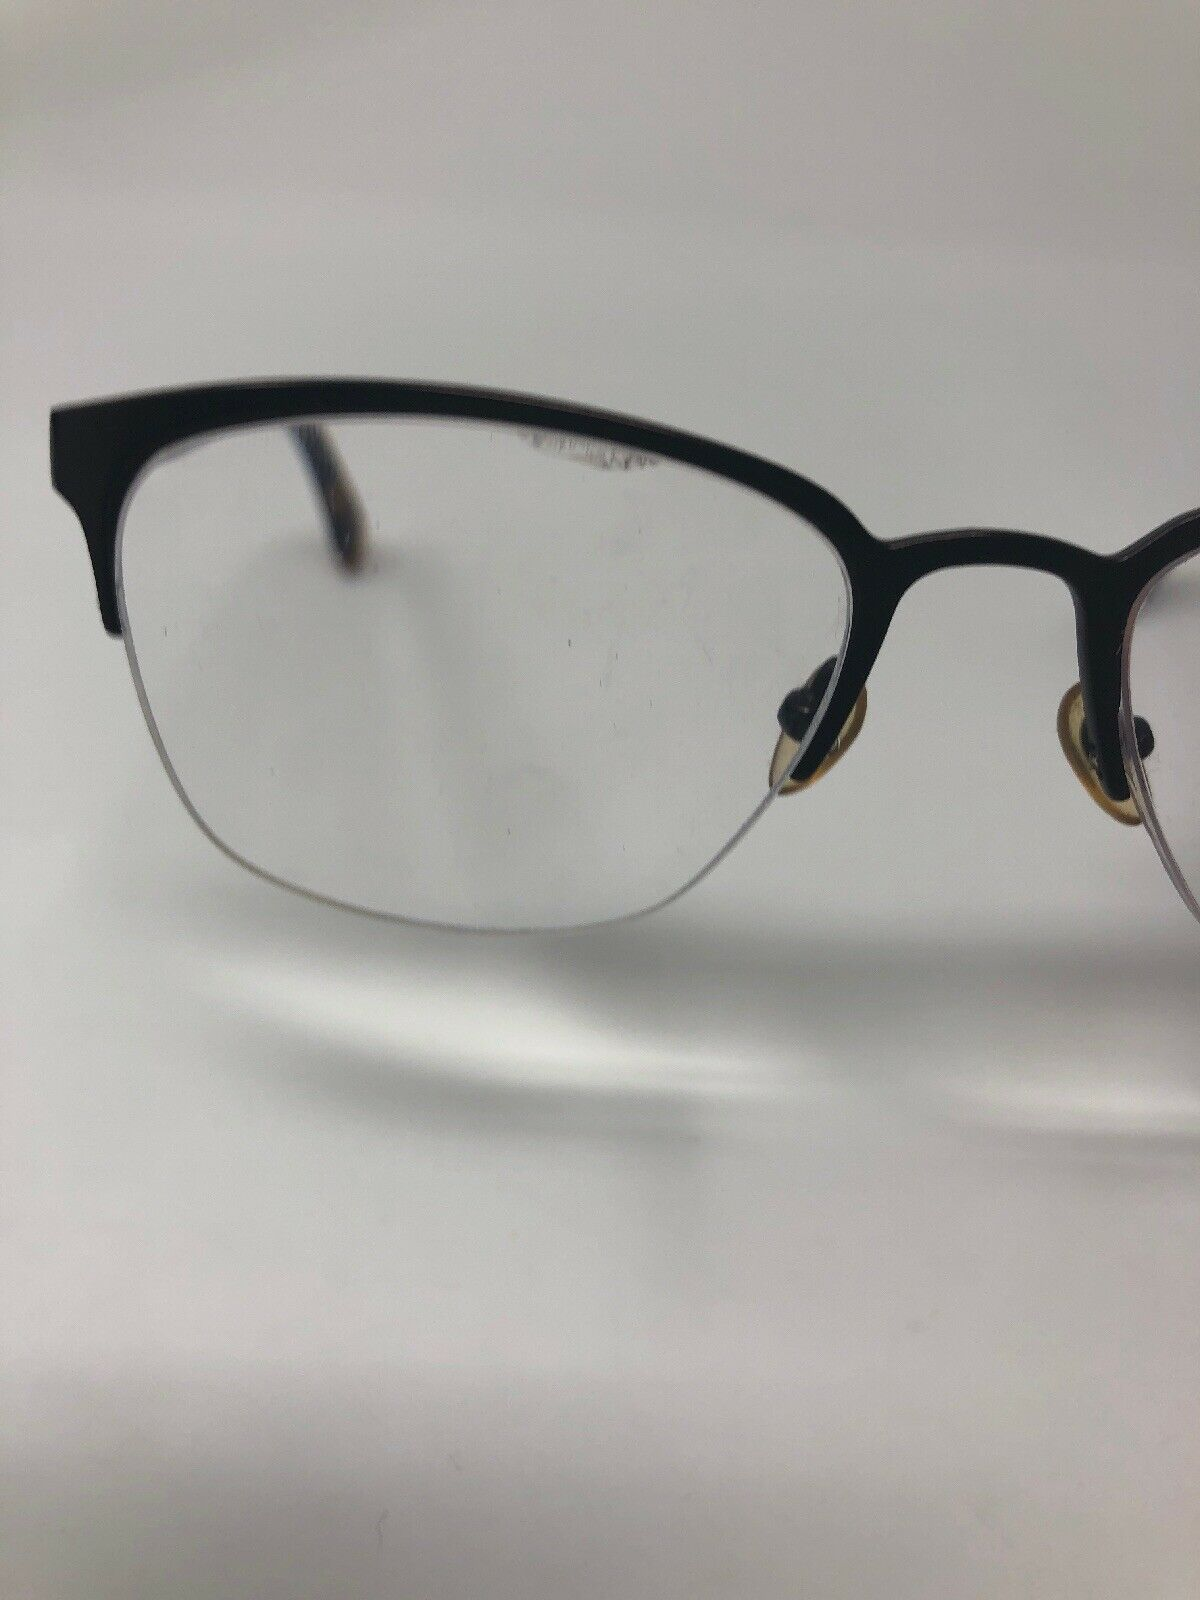 MICHAEL KORS TITANIUM Eyeglasses Frame MK741 200 52-19-140 Brown/Tortoise 7118